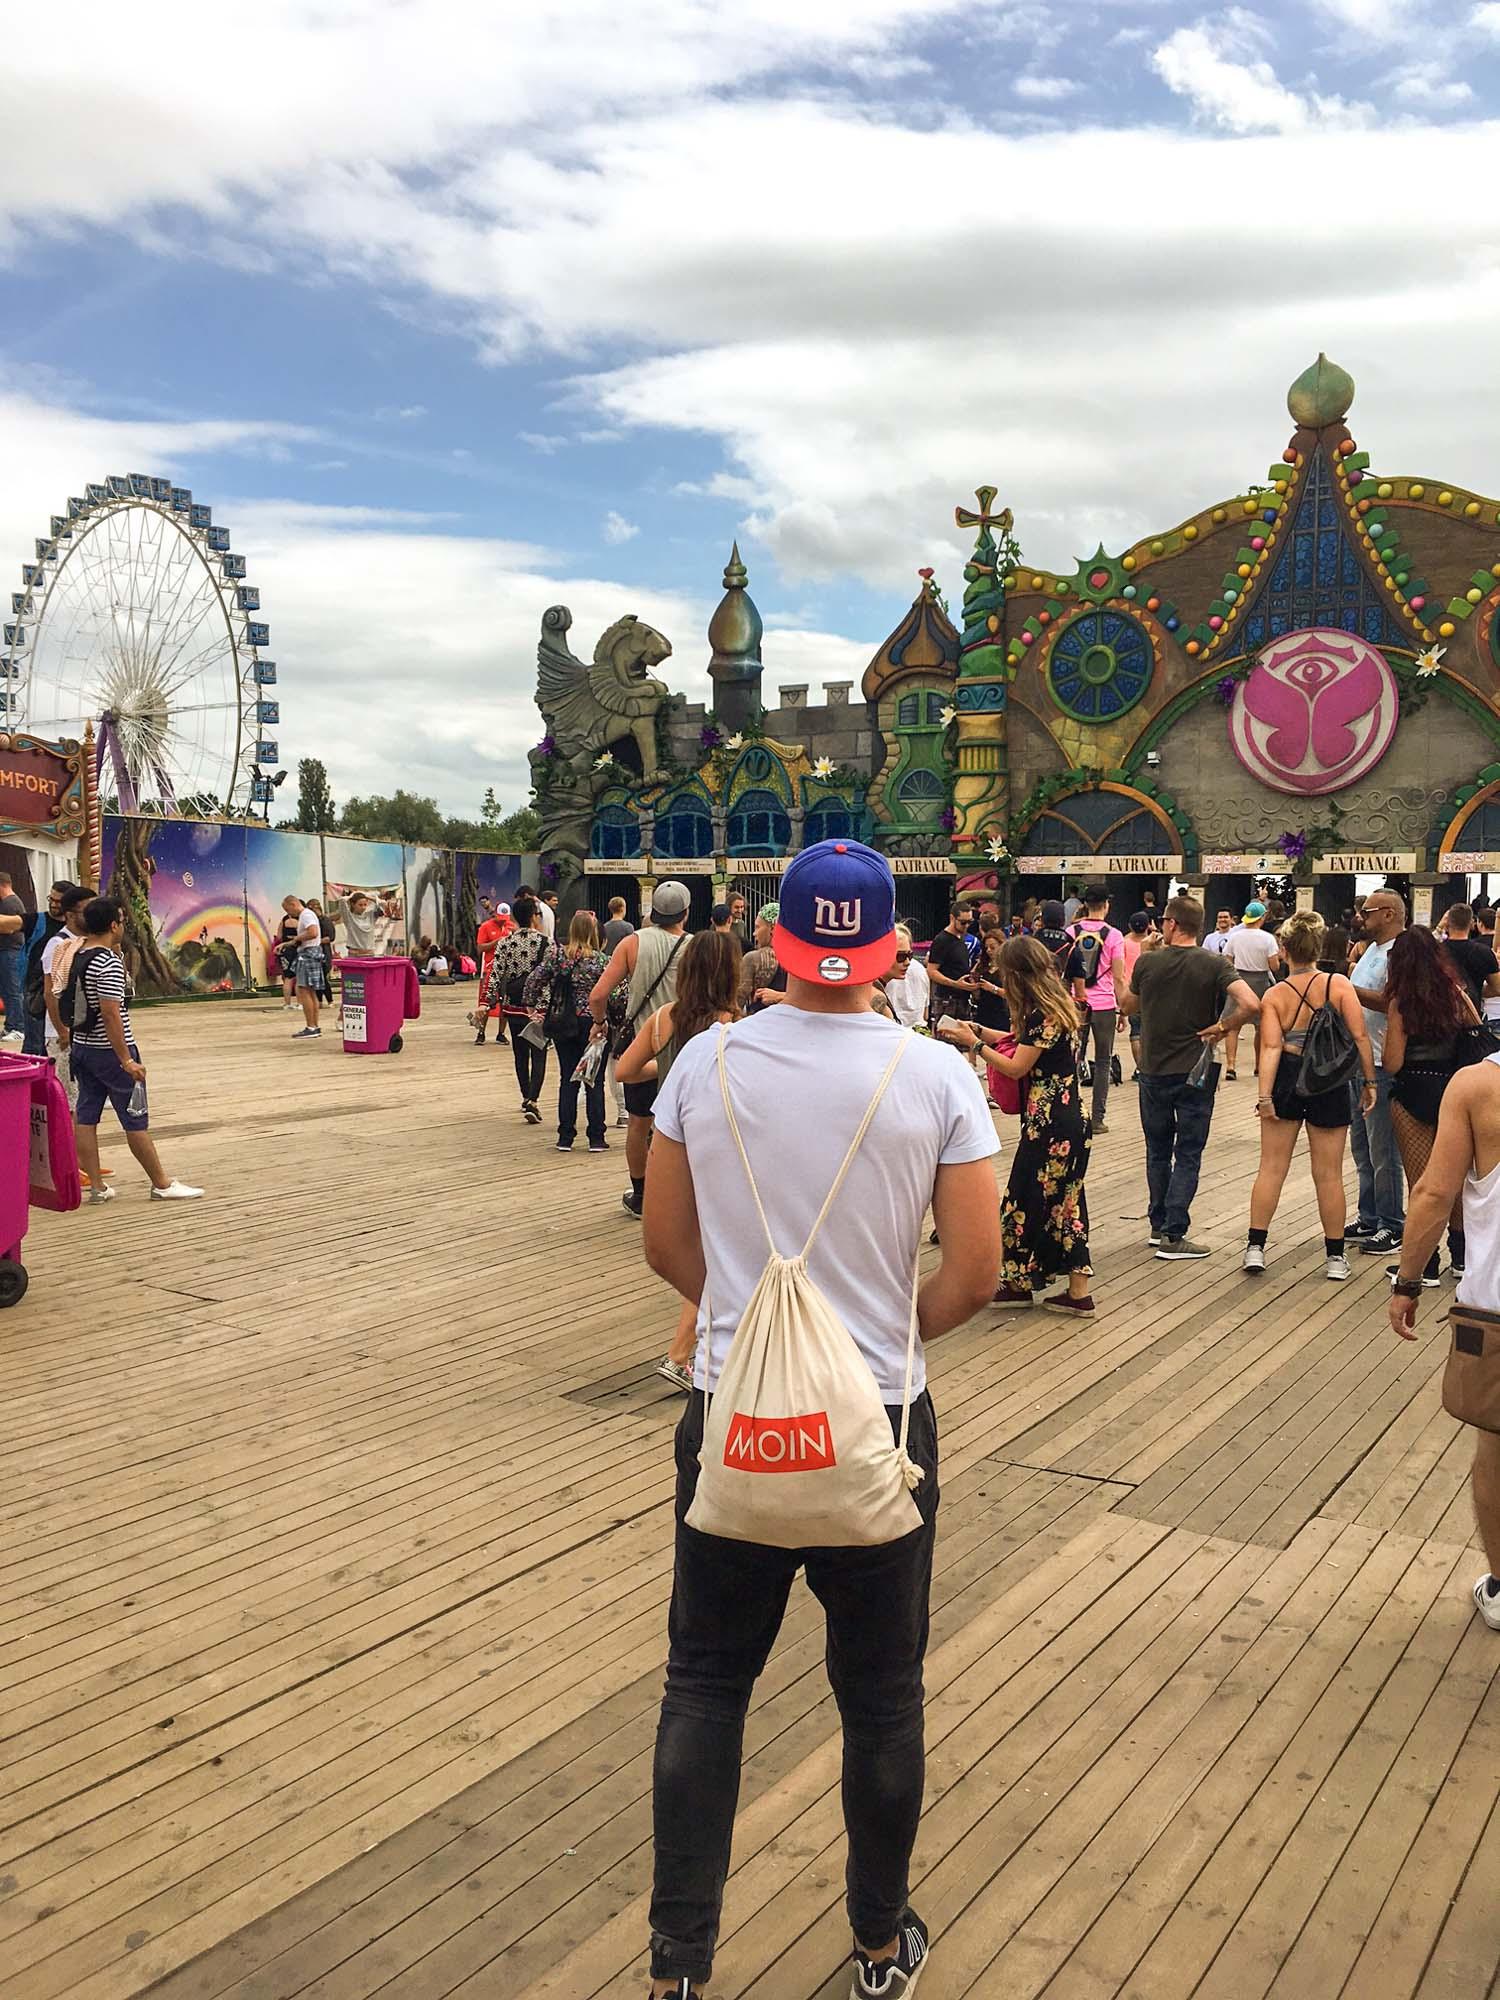 MOIN vom Tomorrowland Festival